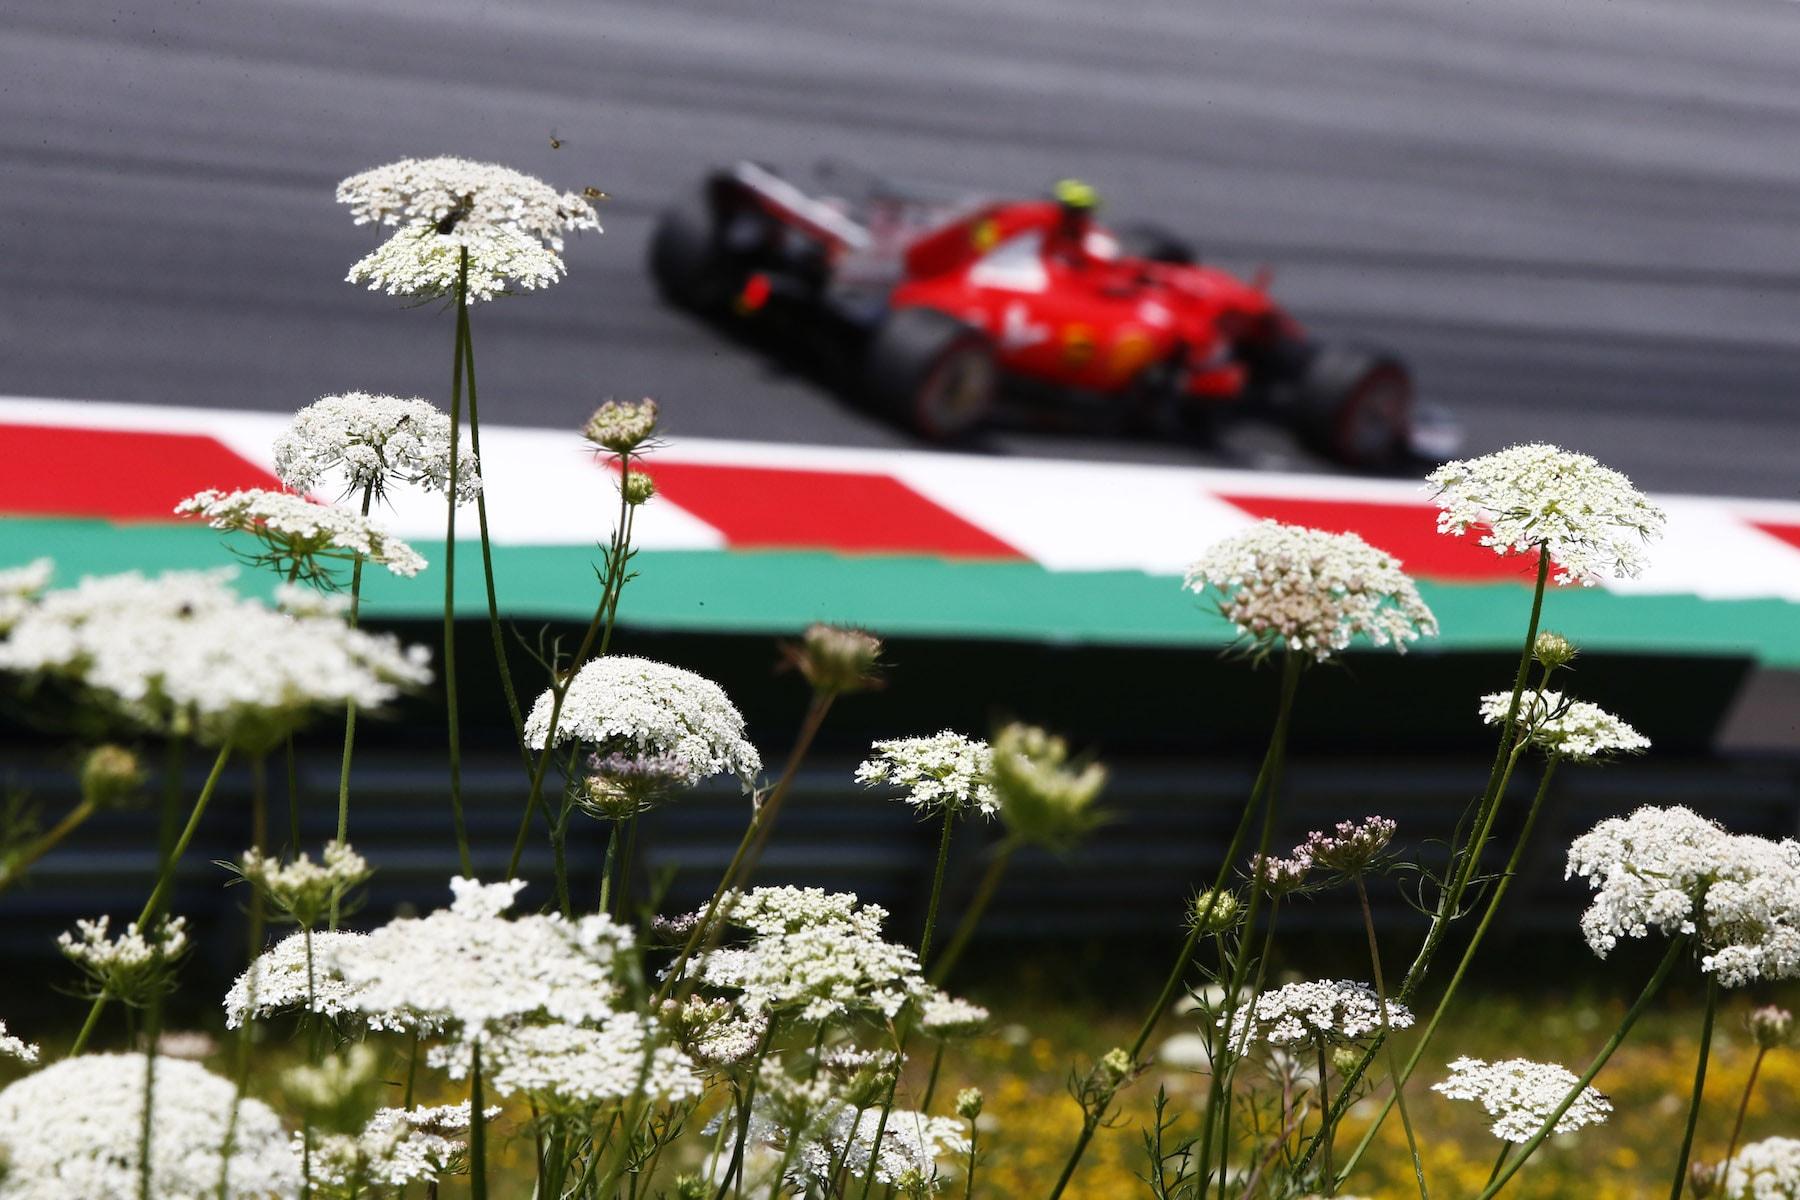 2017 Kimi Raikkonen | Ferrari SF70H | 2017 Austrian GP FP2 5 copy.jpg